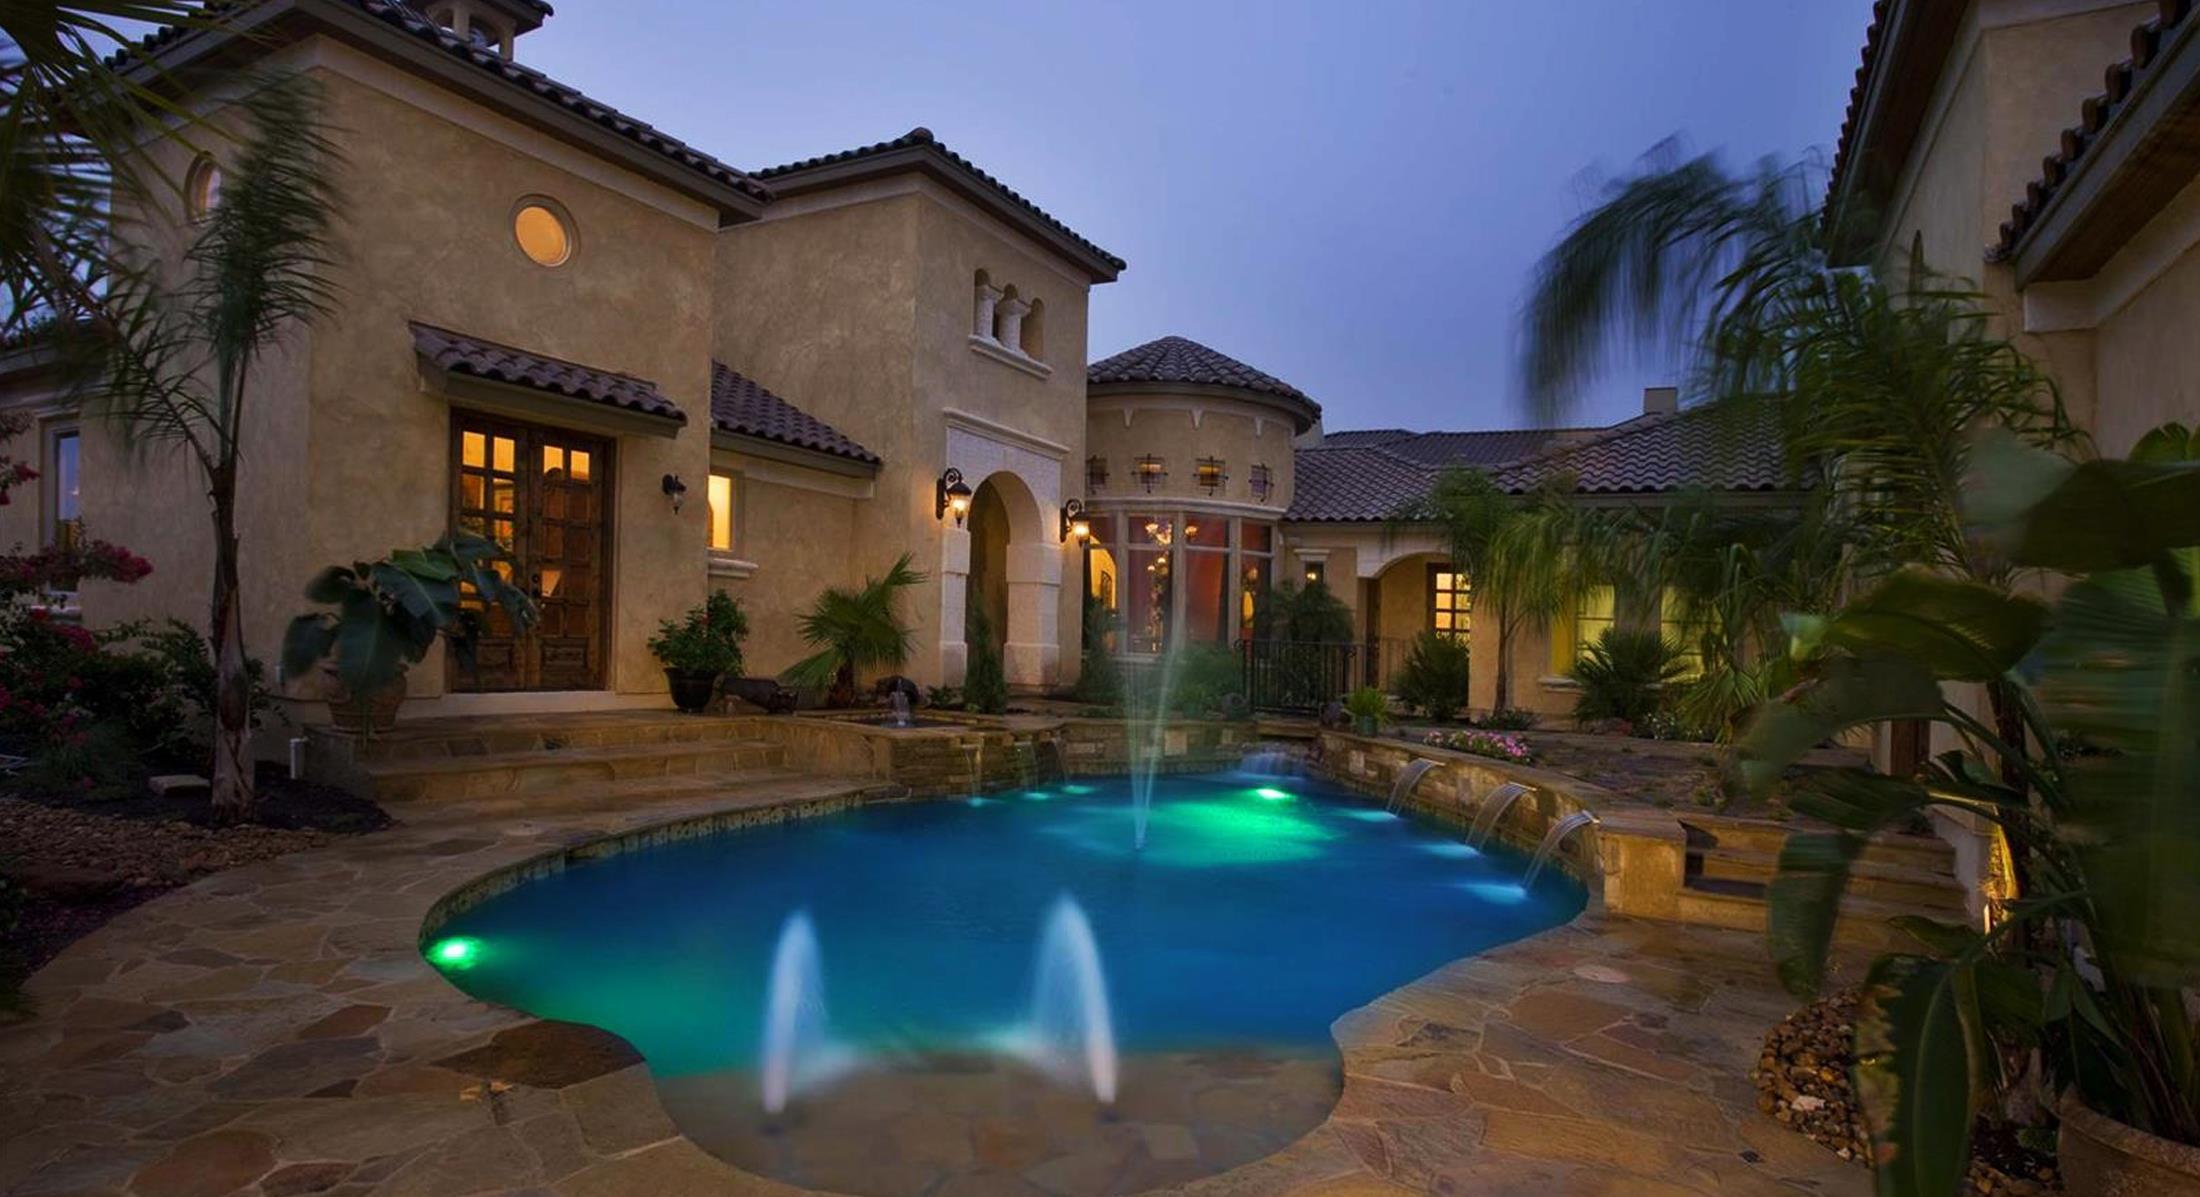 Best Kitchen Gallery: Genesis Custom Homes Luxury Home Builder San Antonio Texas of Home Builders San Antonio Texas on rachelxblog.com